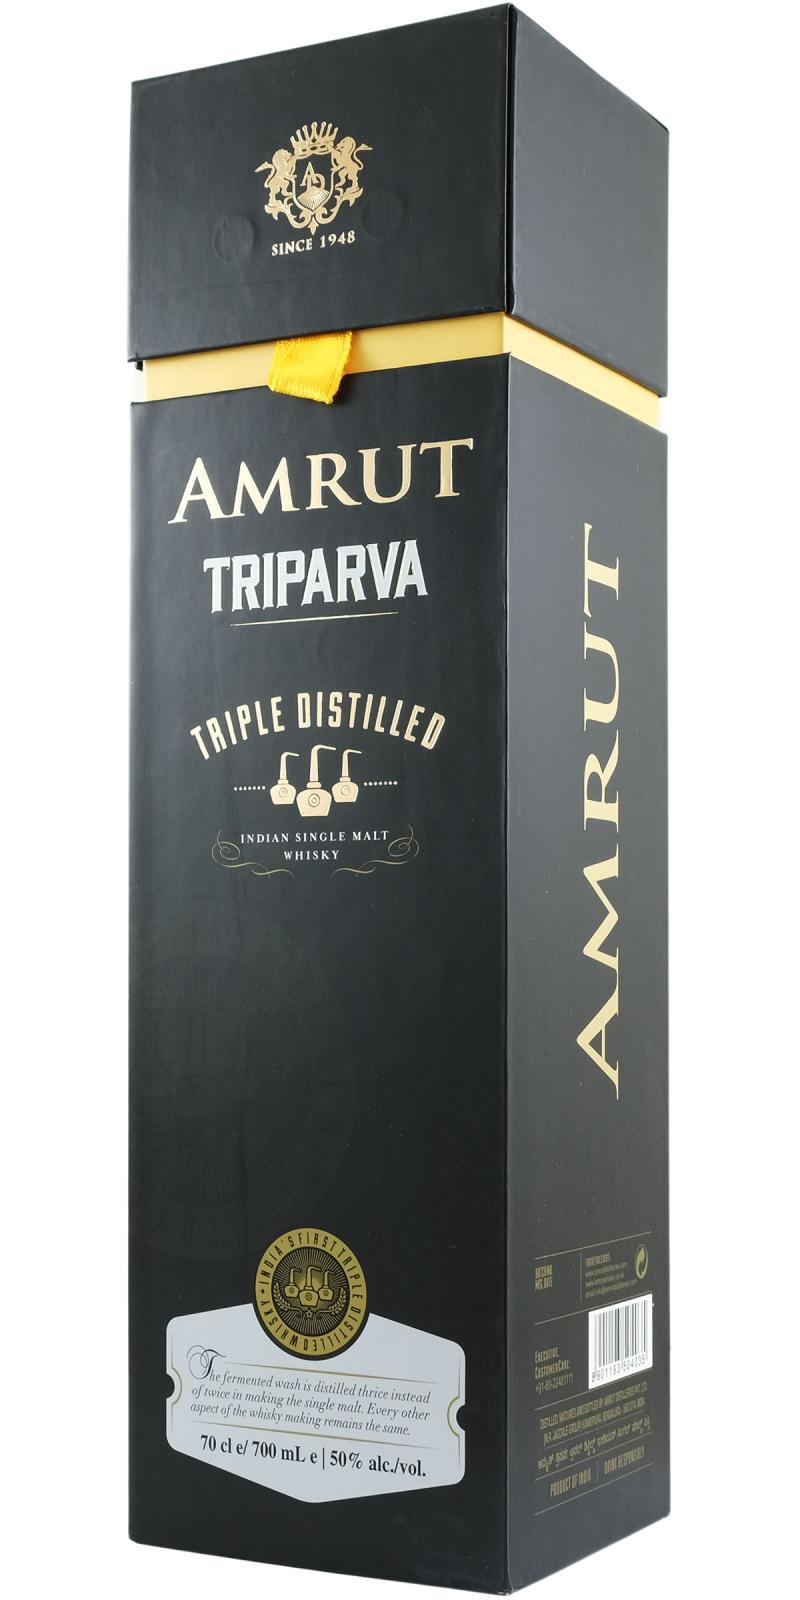 Amrut Triparva